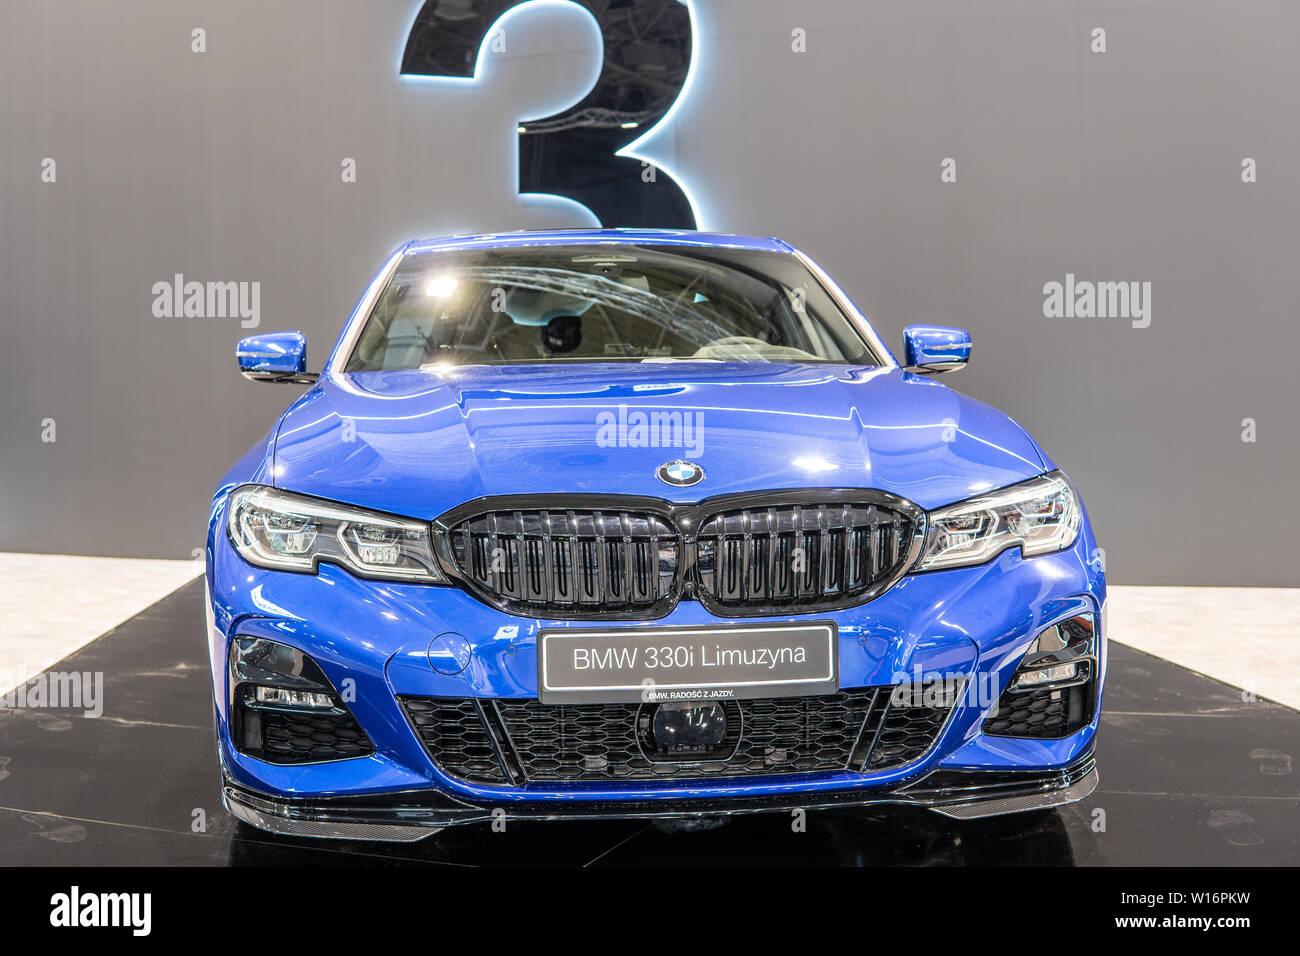 Poznan Poland Mar 2019 Blue All New Bmw 3 Series Sedan Limousine